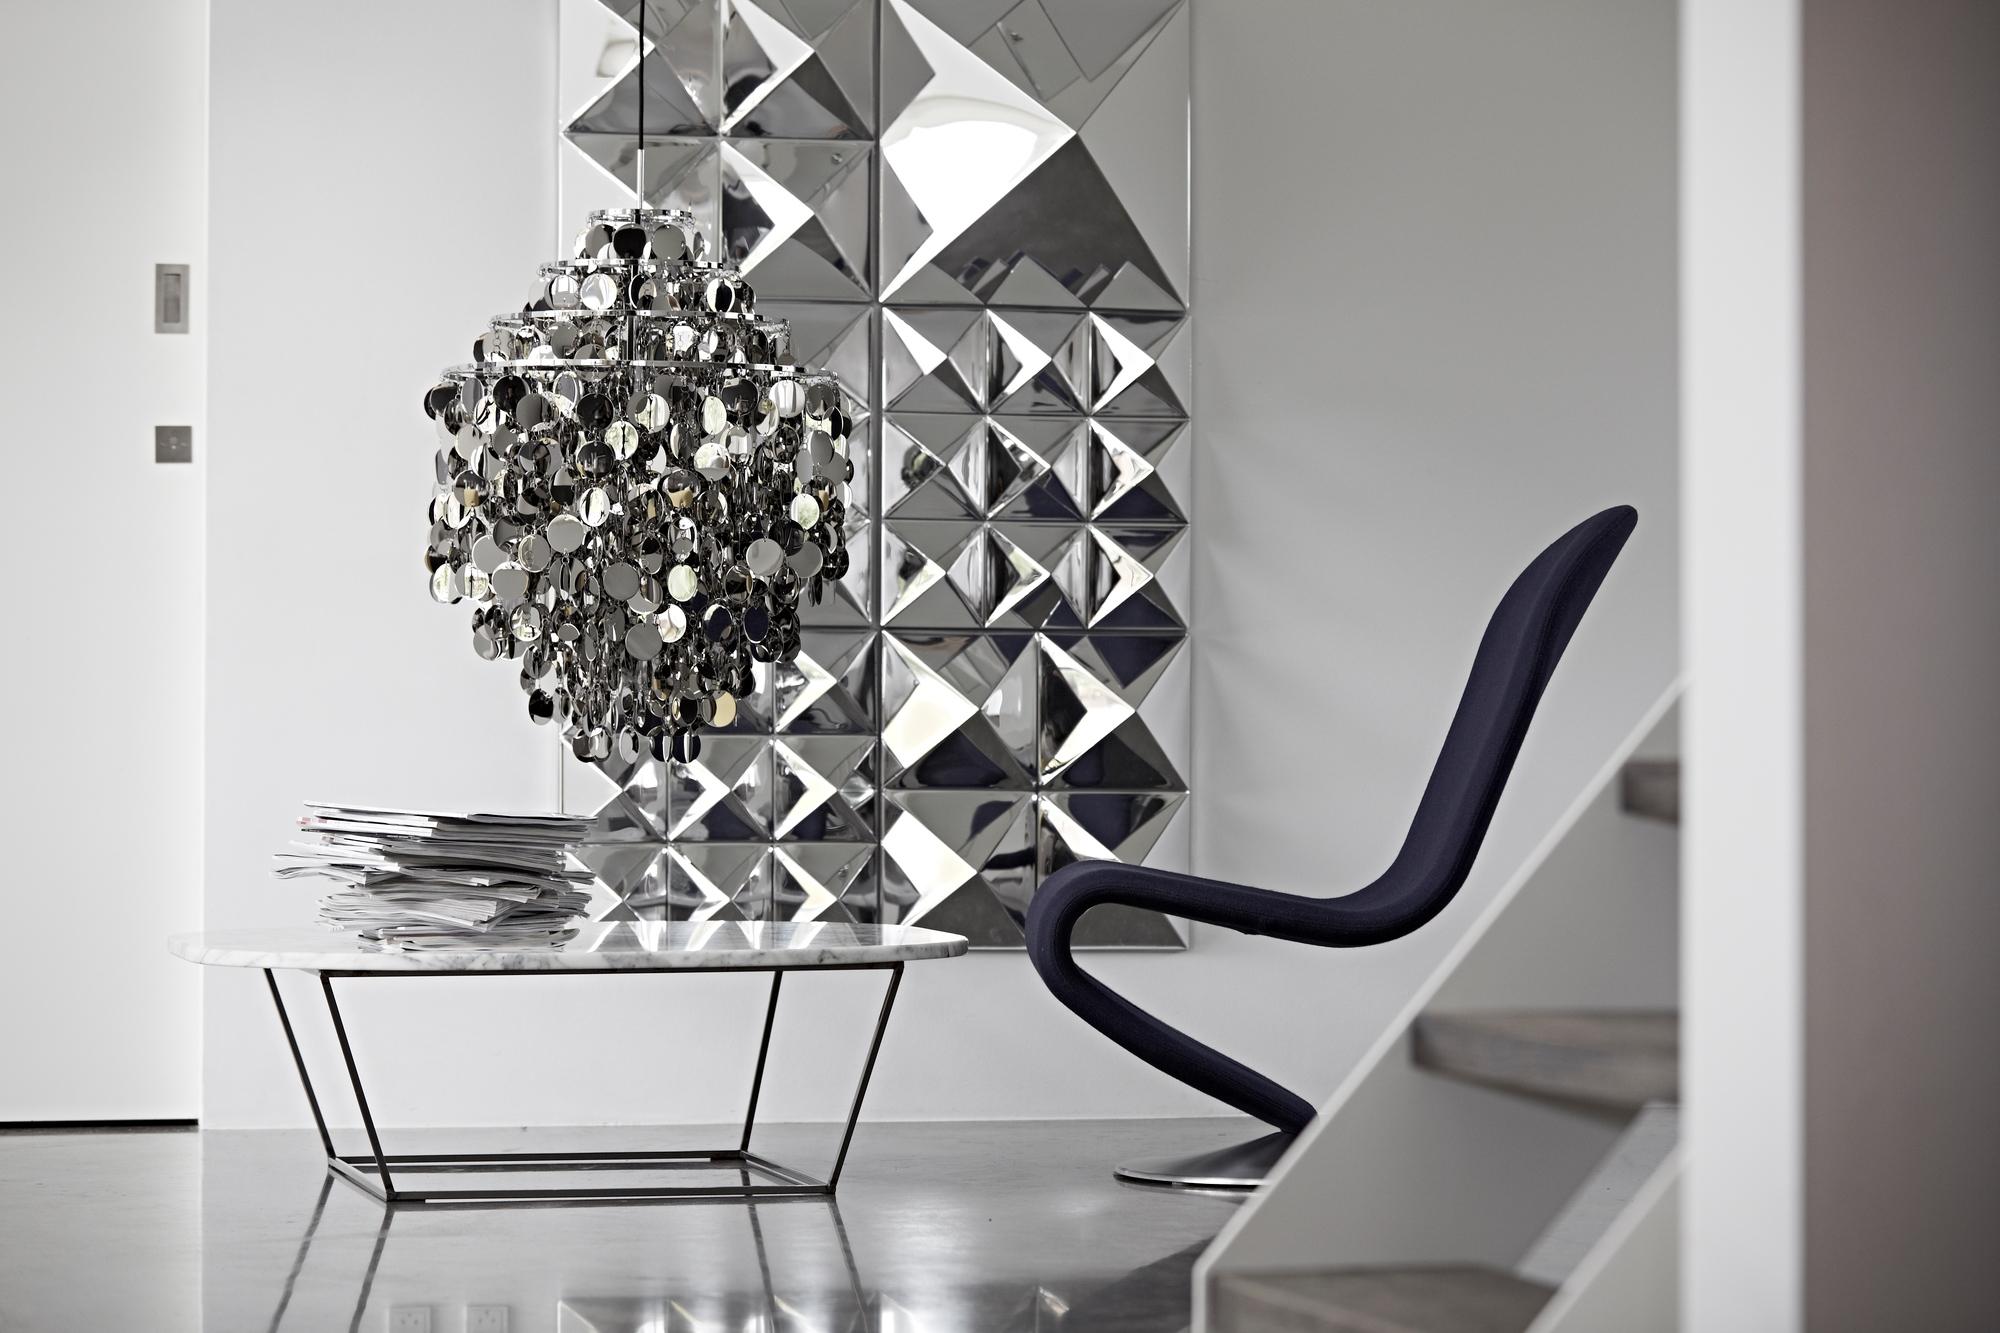 Mirror Sculptures Spiegel 4 Pyramiden Verpan